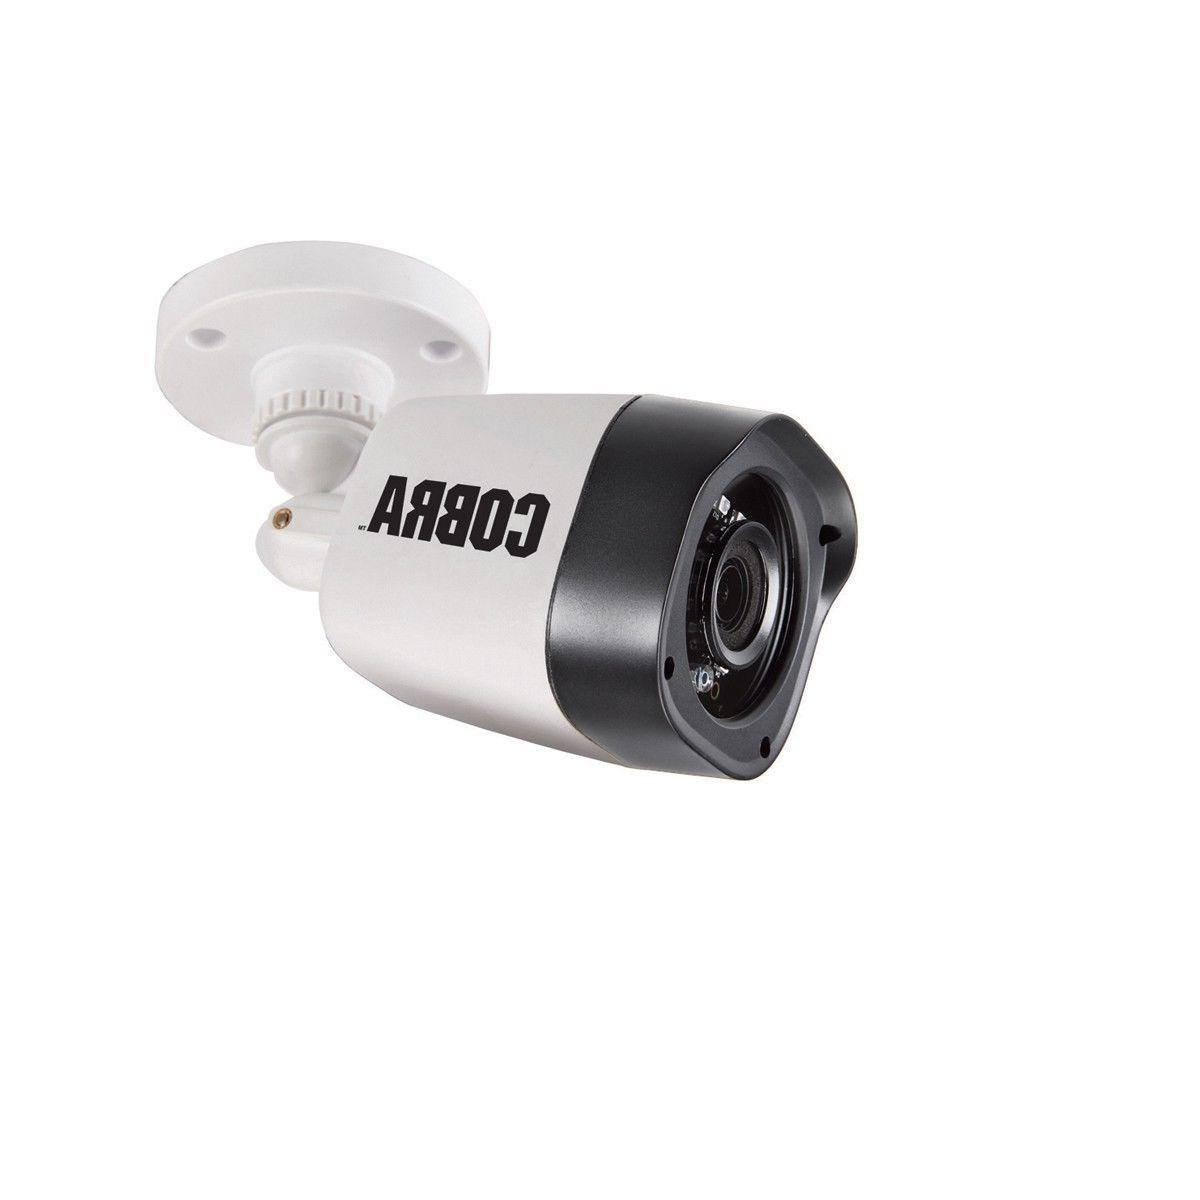 hd color surveillance dvr camera with night